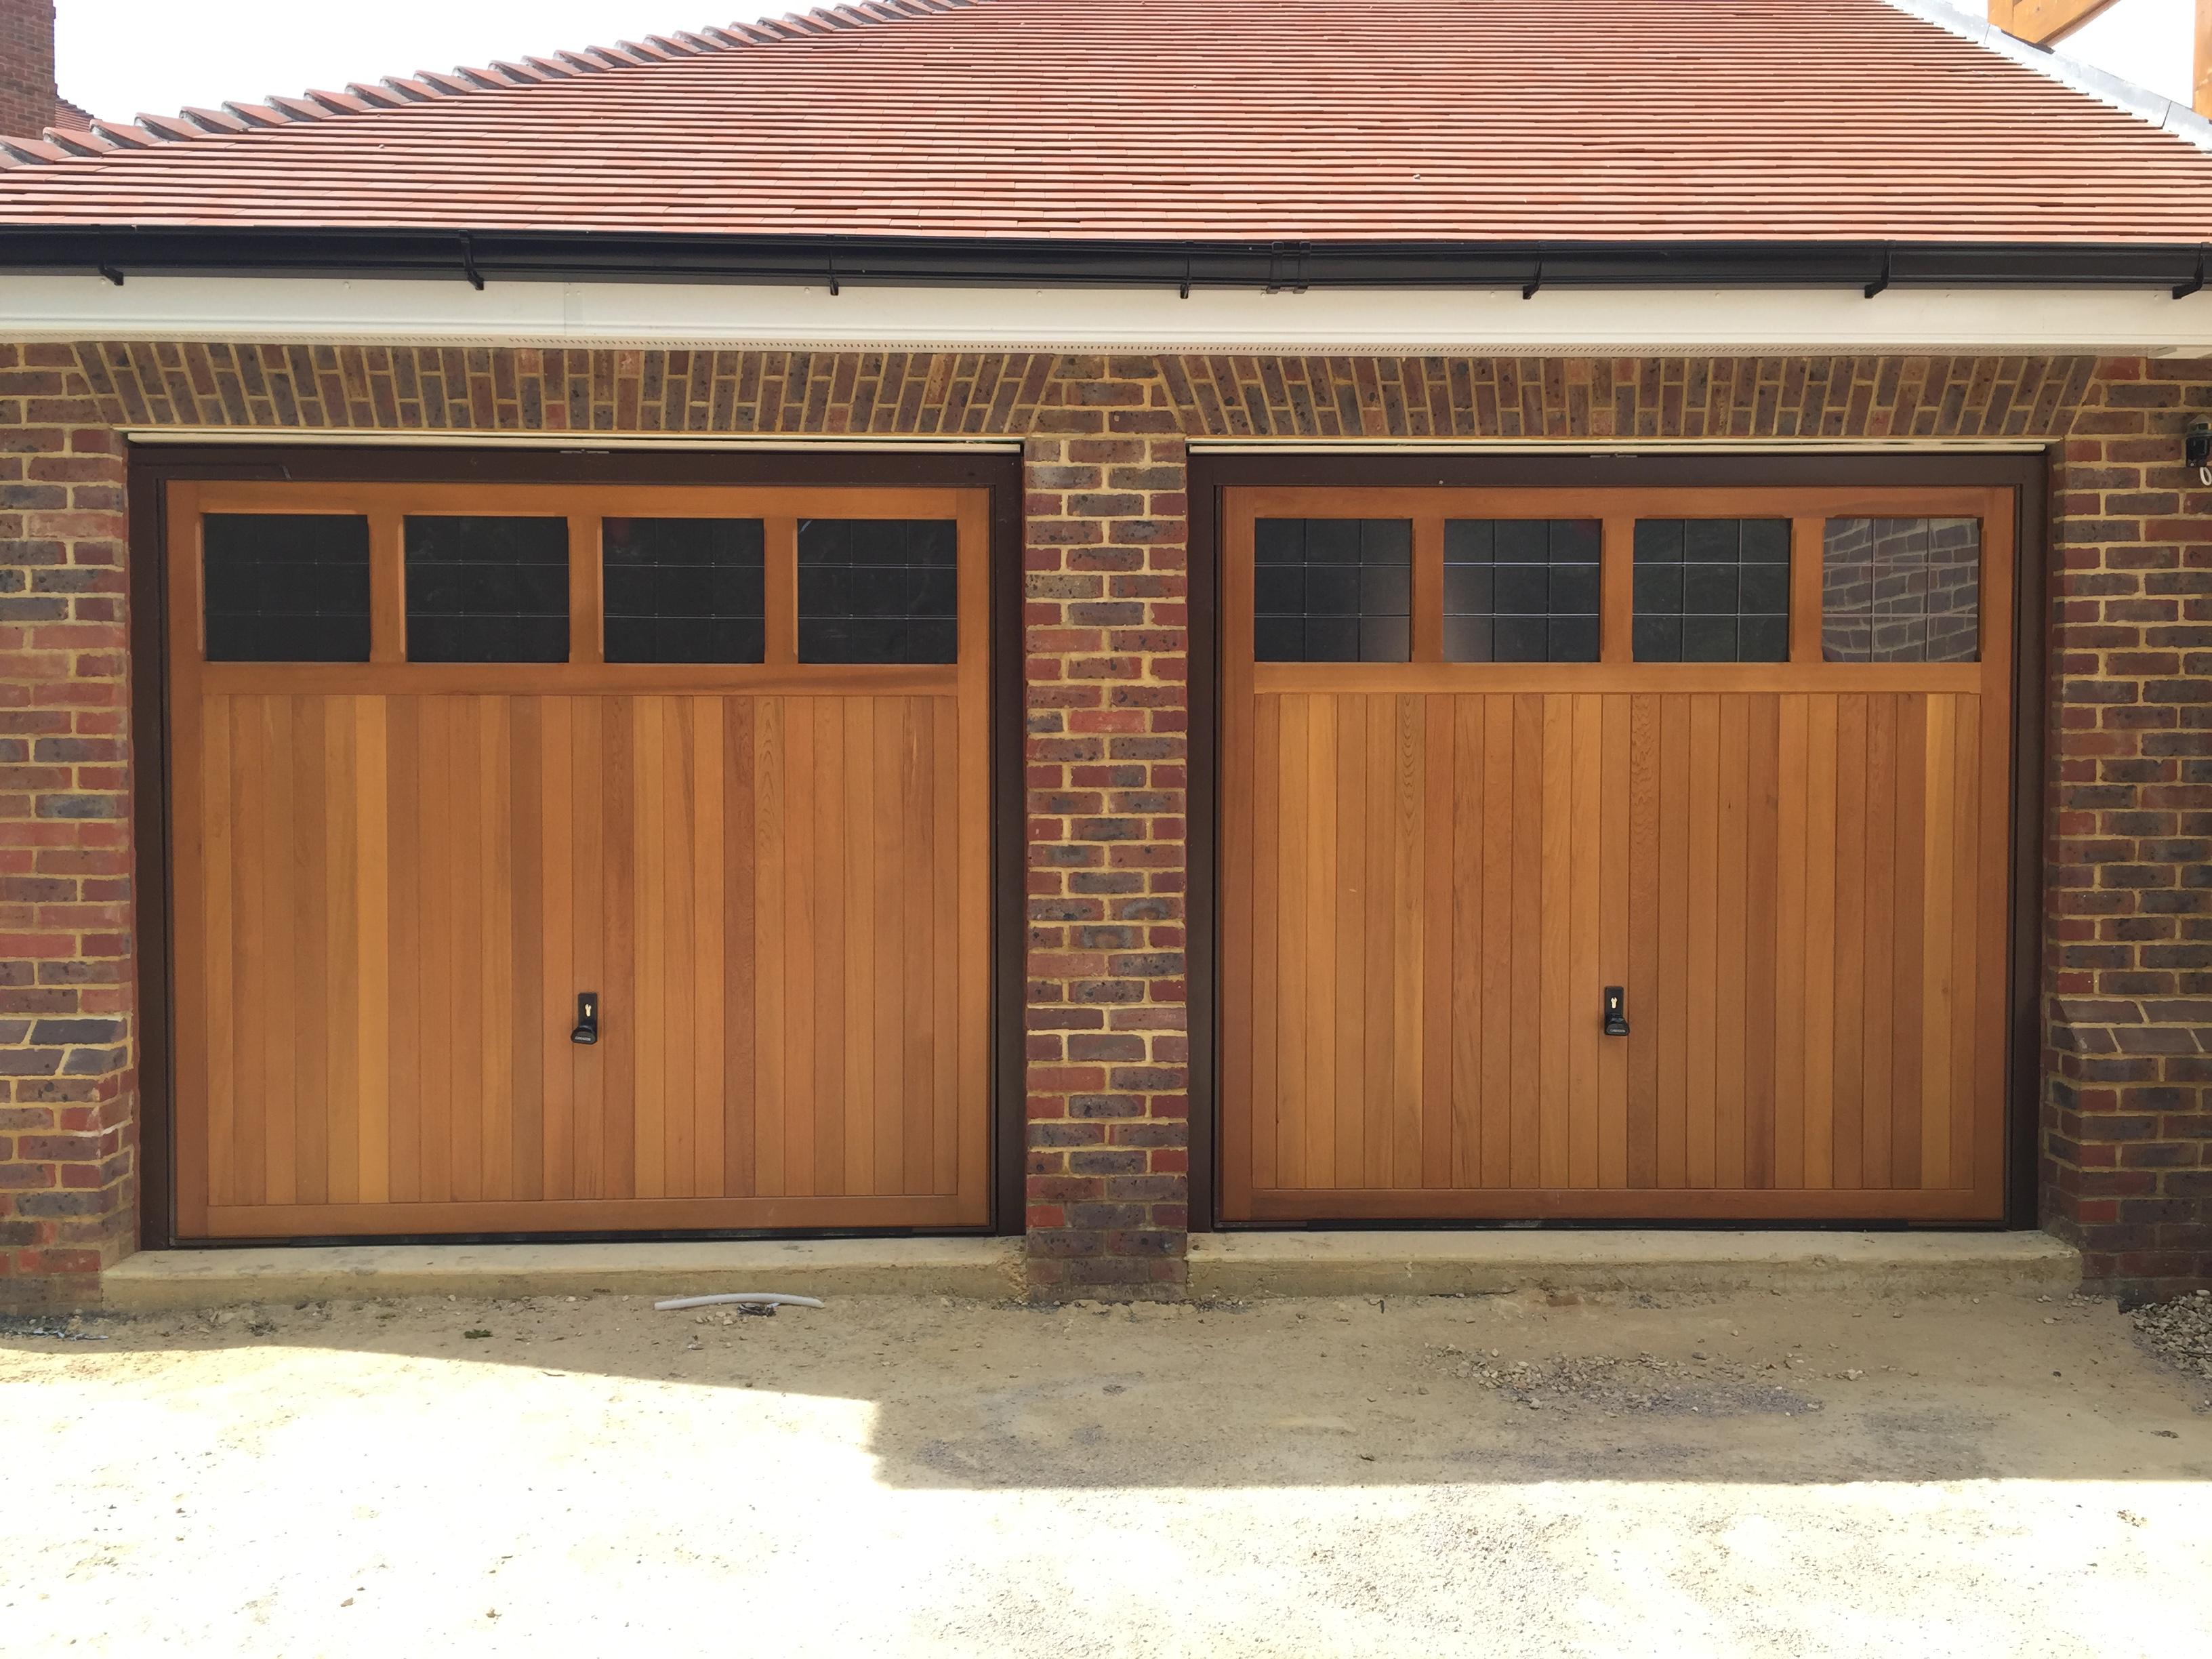 2448 #966035  Productive Week Despite It Being Only Four Days – Garage Doors image Garage Doors Company 35833264